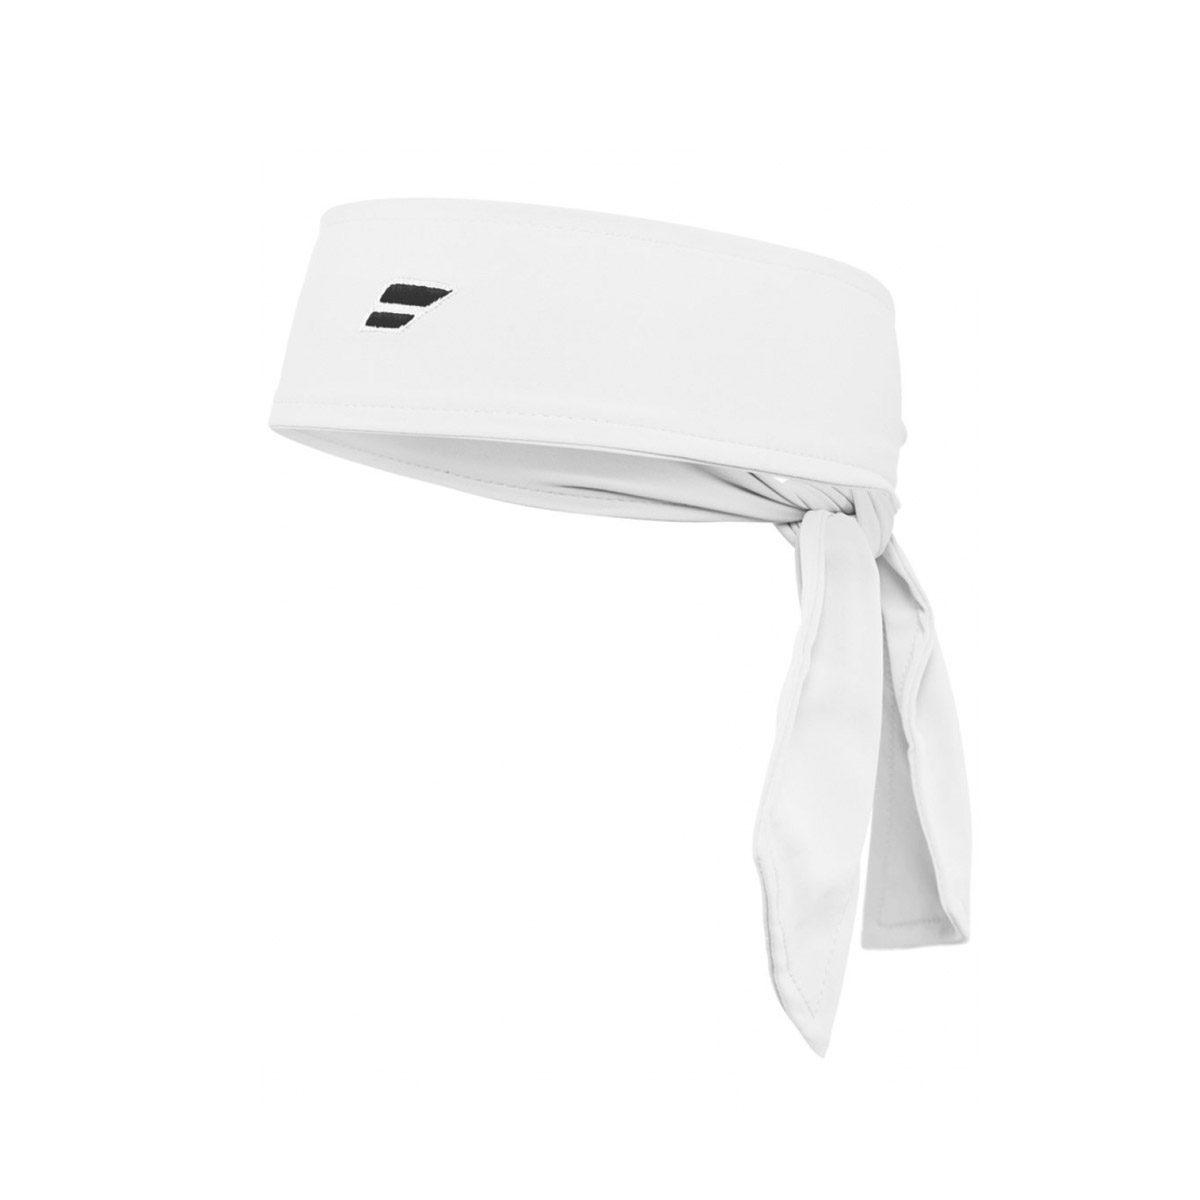 Babolat Unisex Bandana - White - Peake Performance Sports 0576d9e20a55